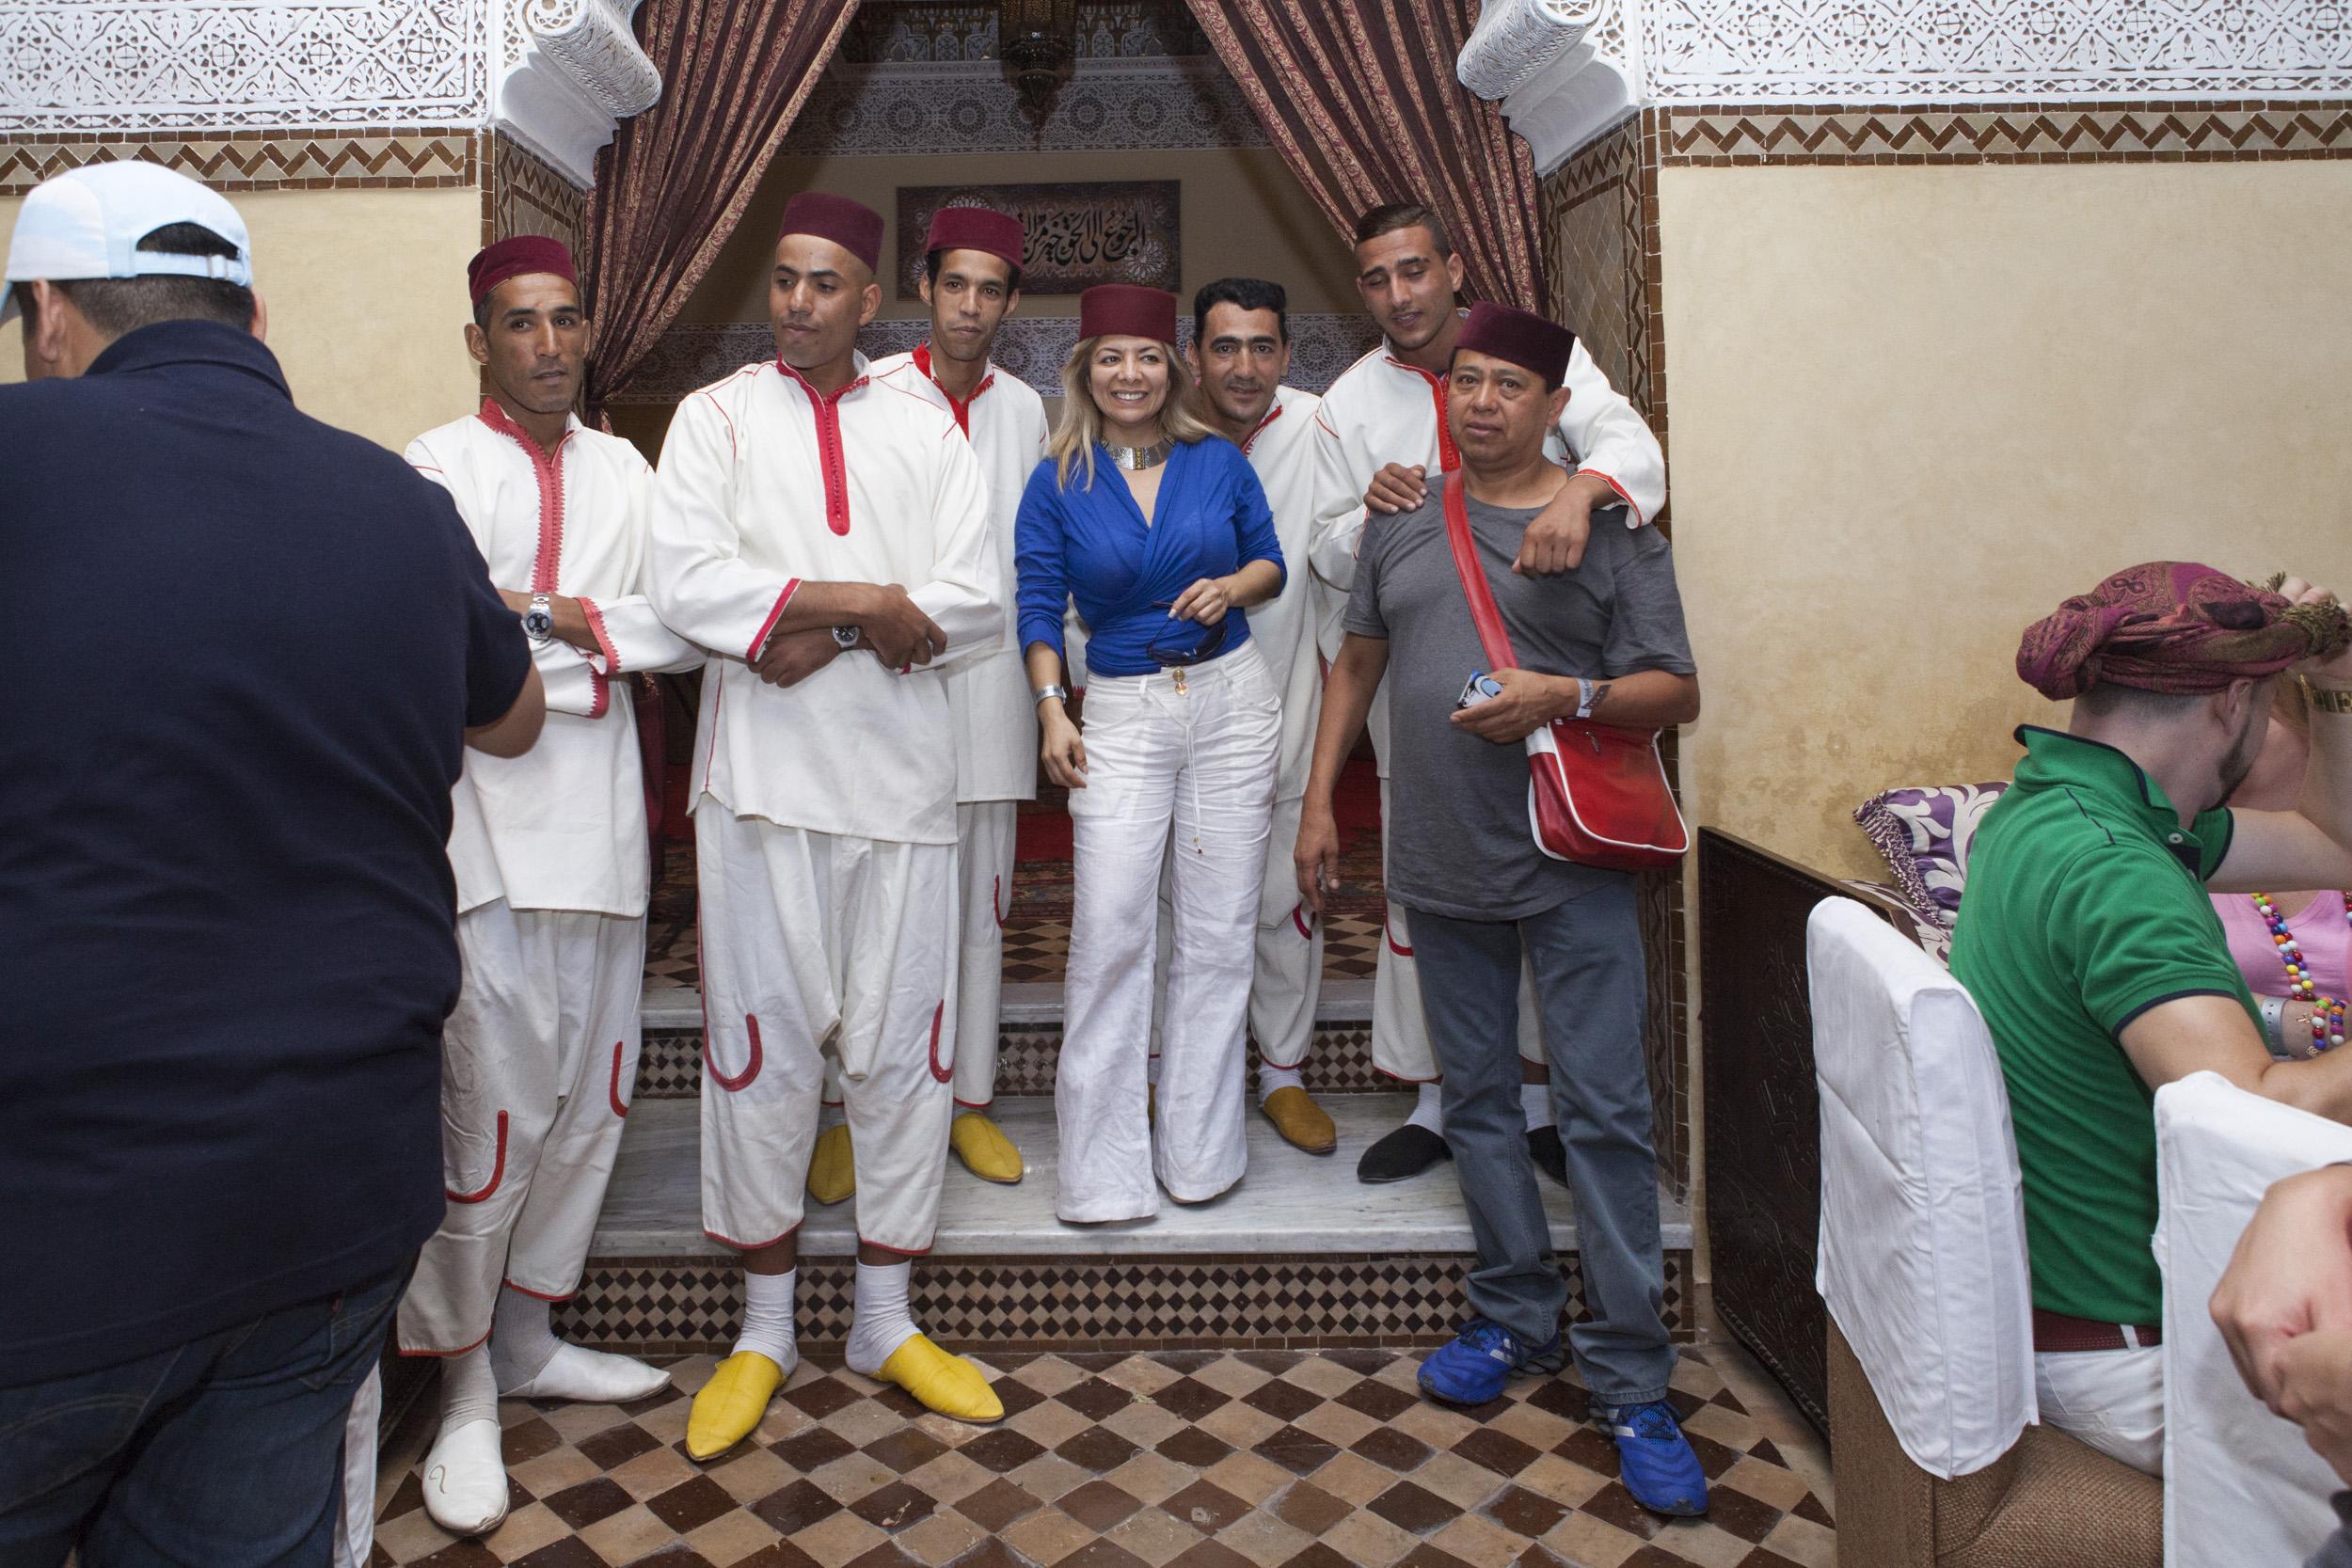 marrakech_2_convencion_anual_salerm_cosmetics_proline_14